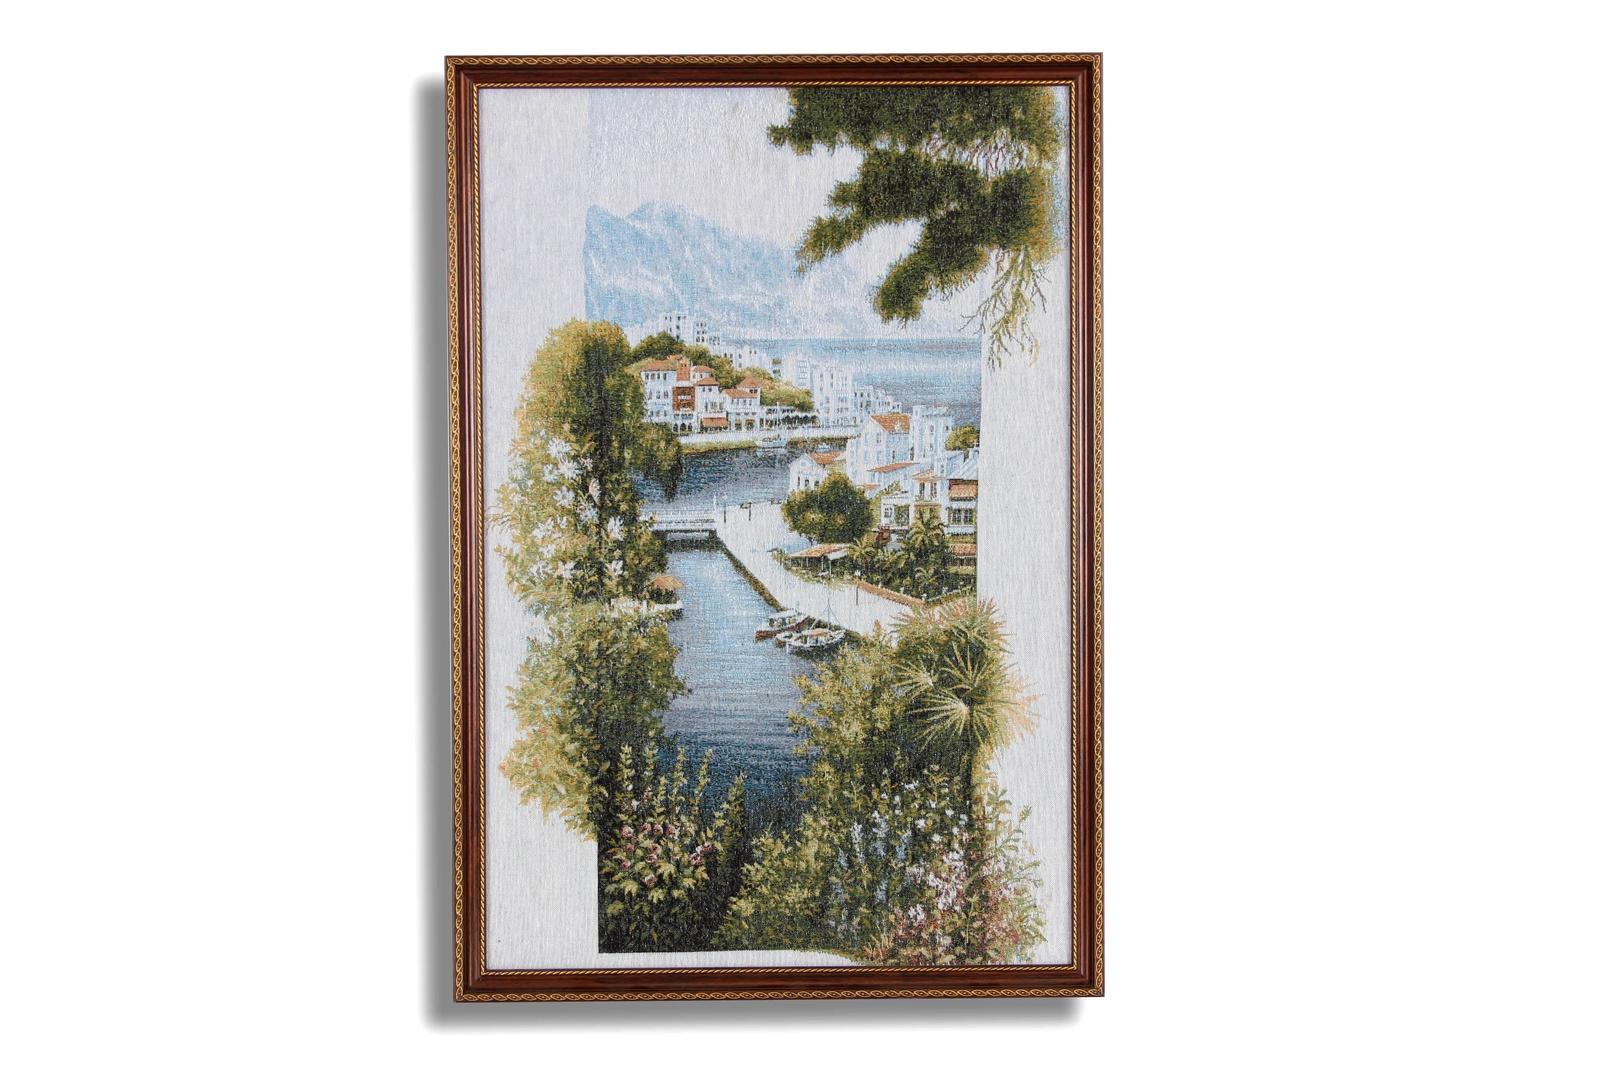 цена на Картина Магазин гобеленов Ветер странствий 52*74 см, Гобелен